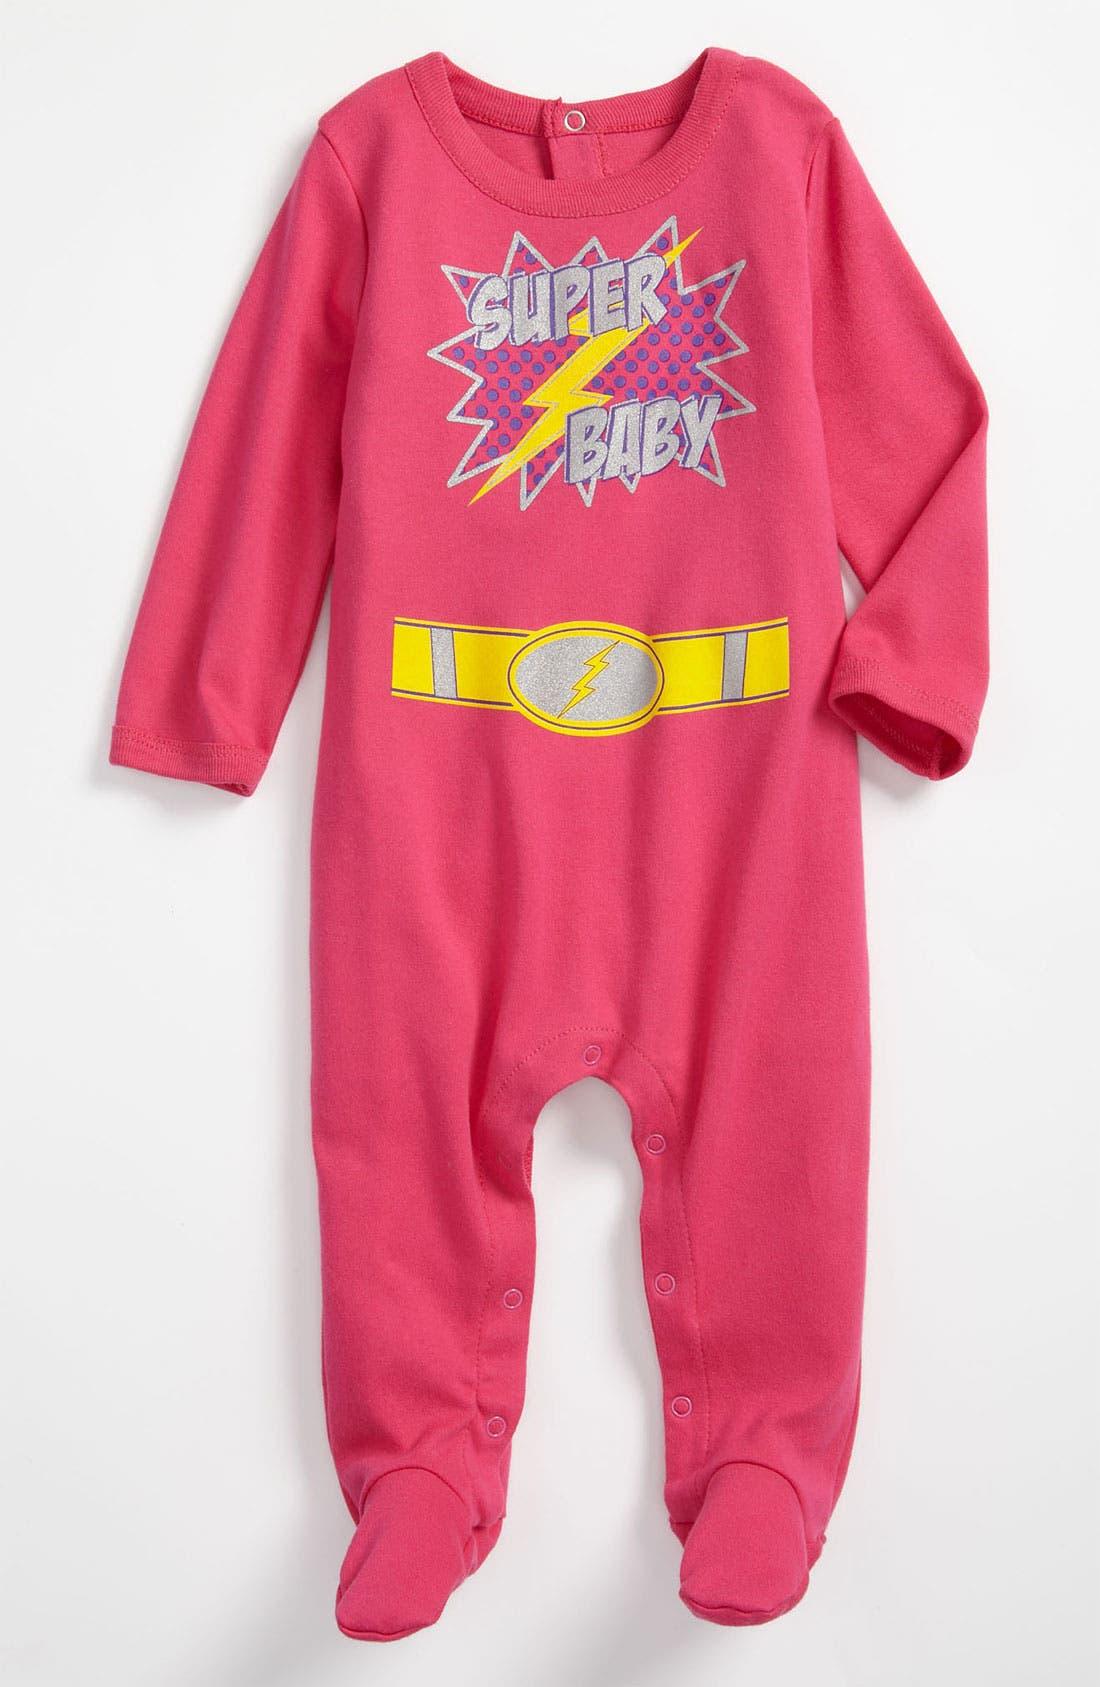 Main Image - Sara Kety Baby & Kids 'Super Baby' Footie (Infant)